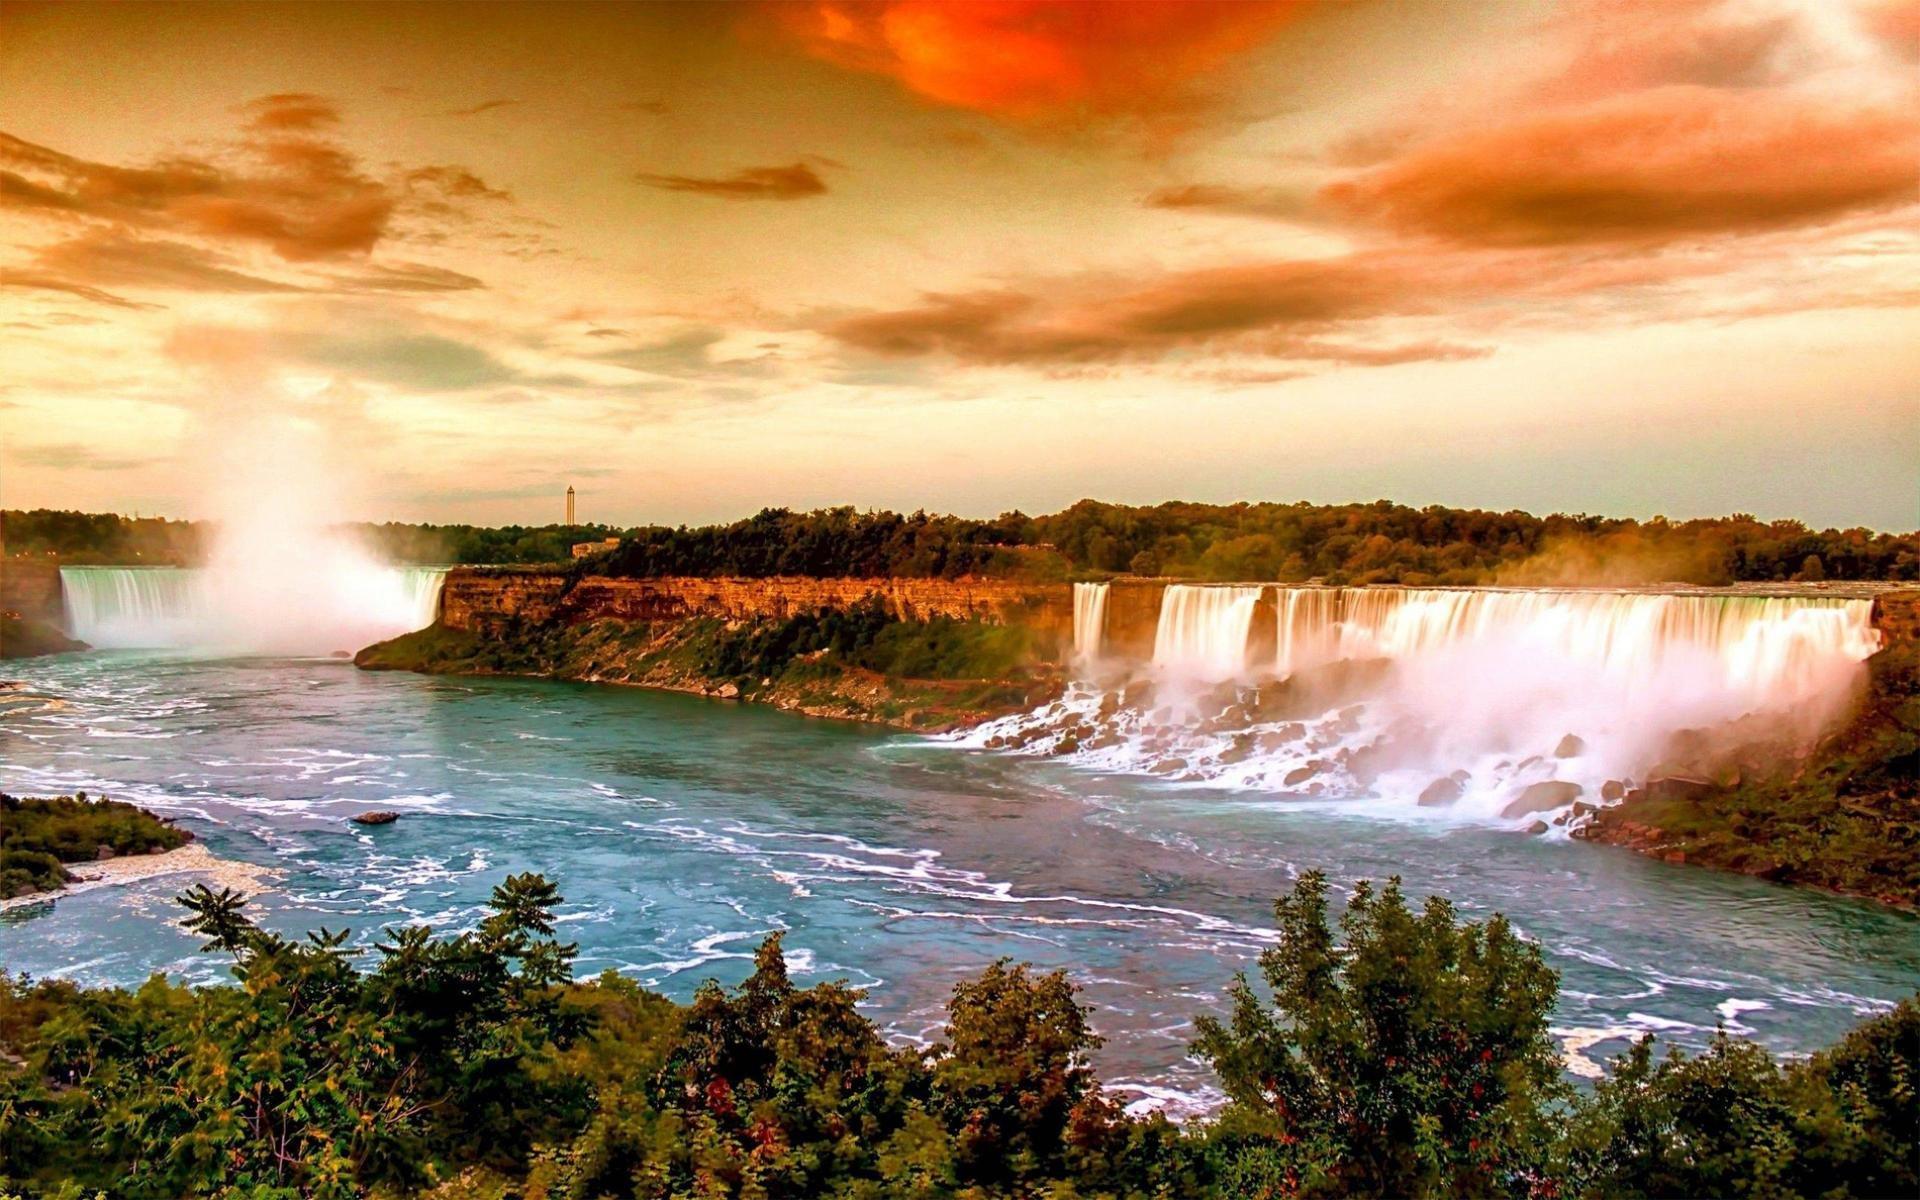 Free Download Niagara Falls Wallpaper Id 67663 Hd 1920x1200 For Computer